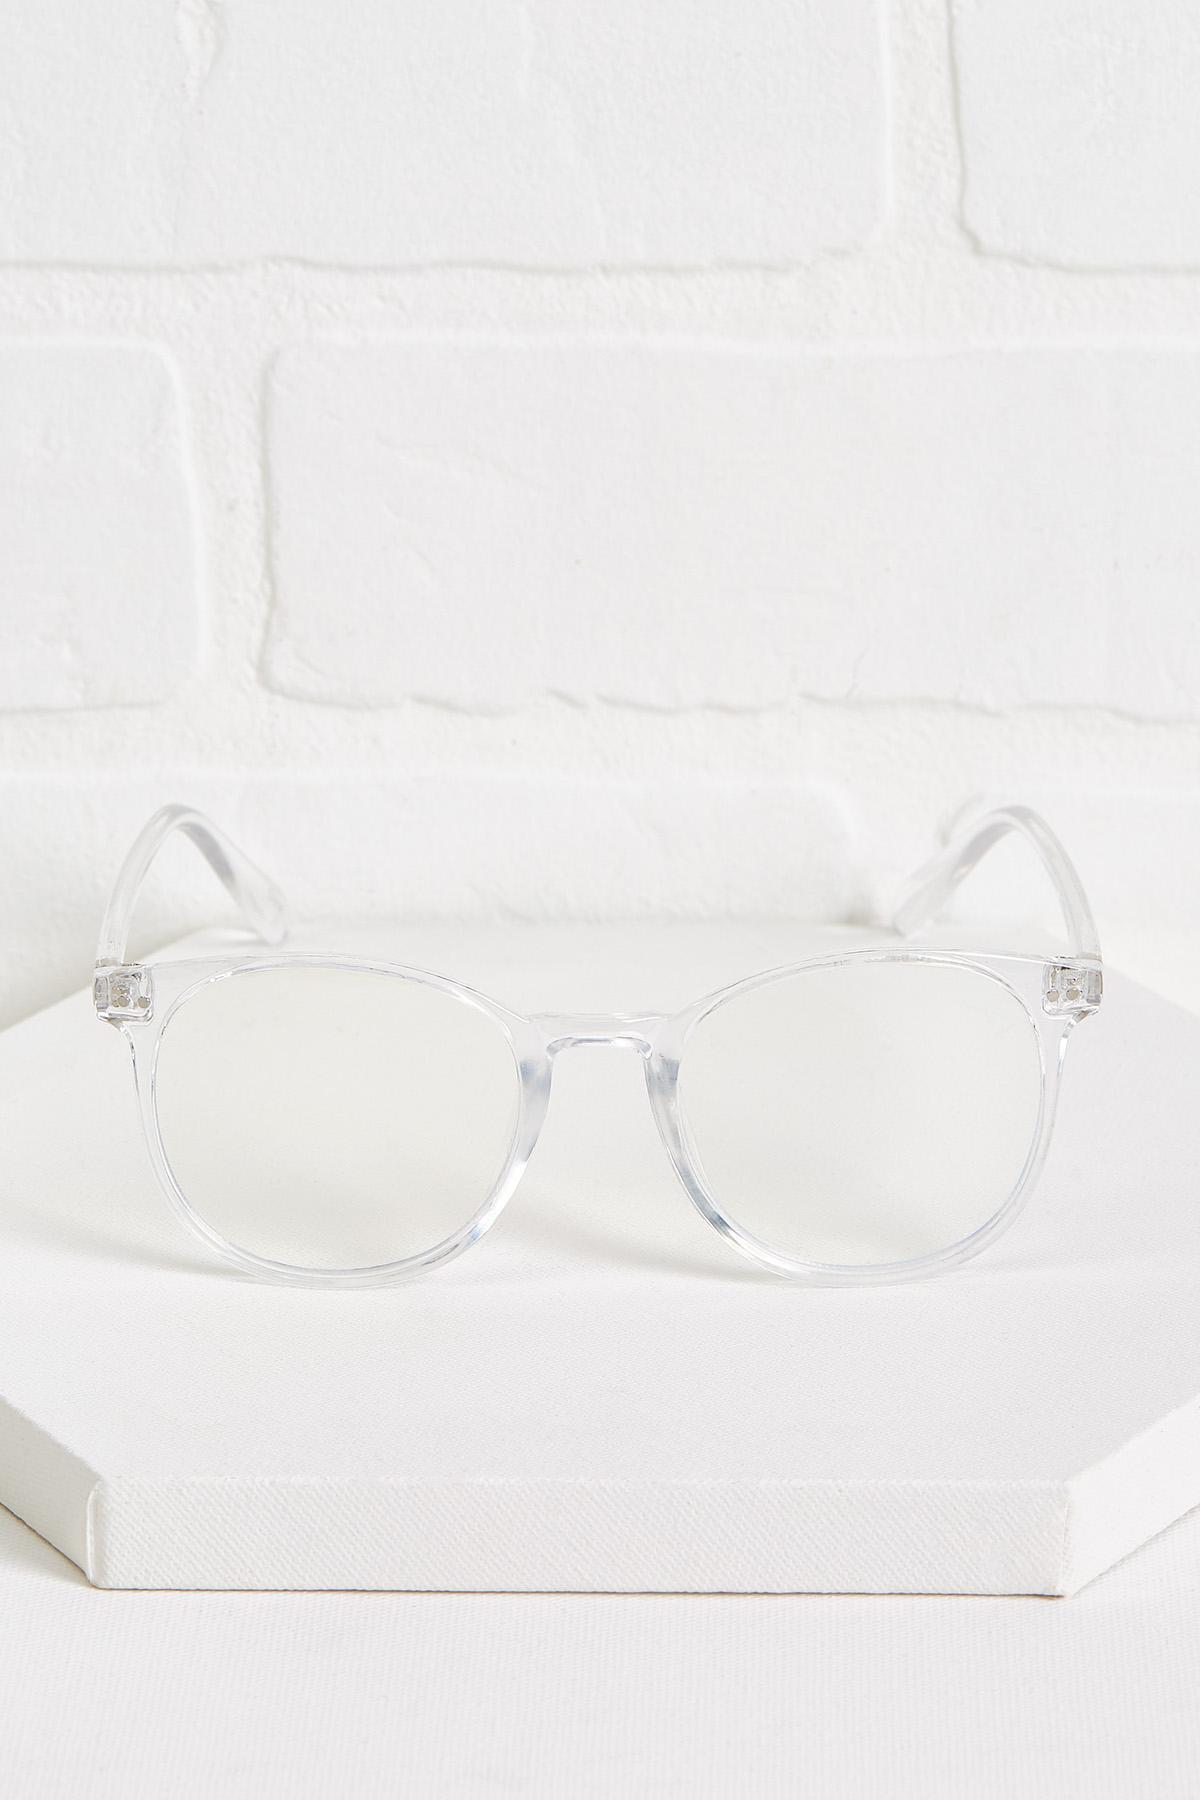 Work From Home Blue Light Glasses